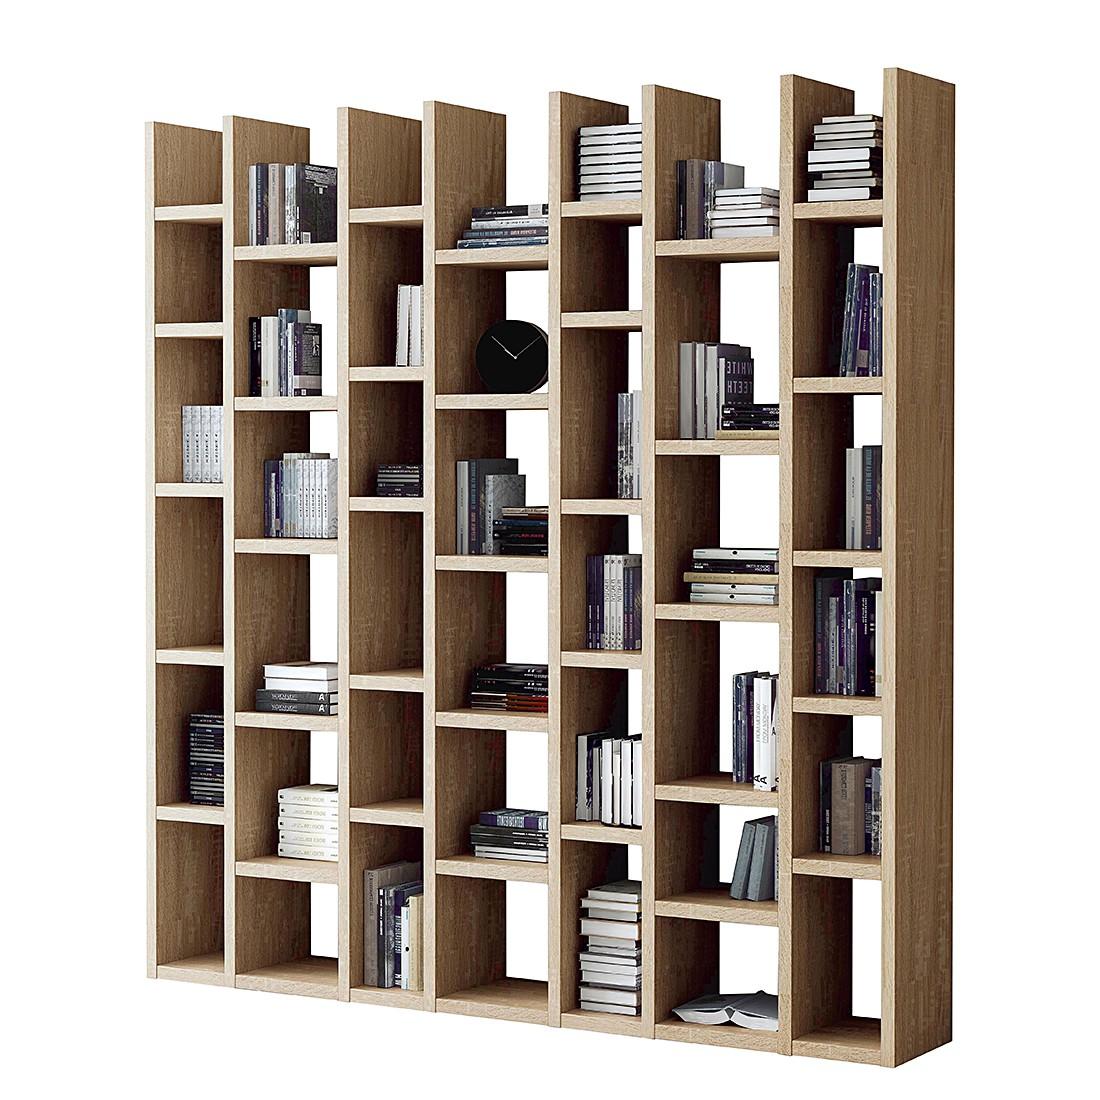 b cherregal u m bel design idee f r sie. Black Bedroom Furniture Sets. Home Design Ideas